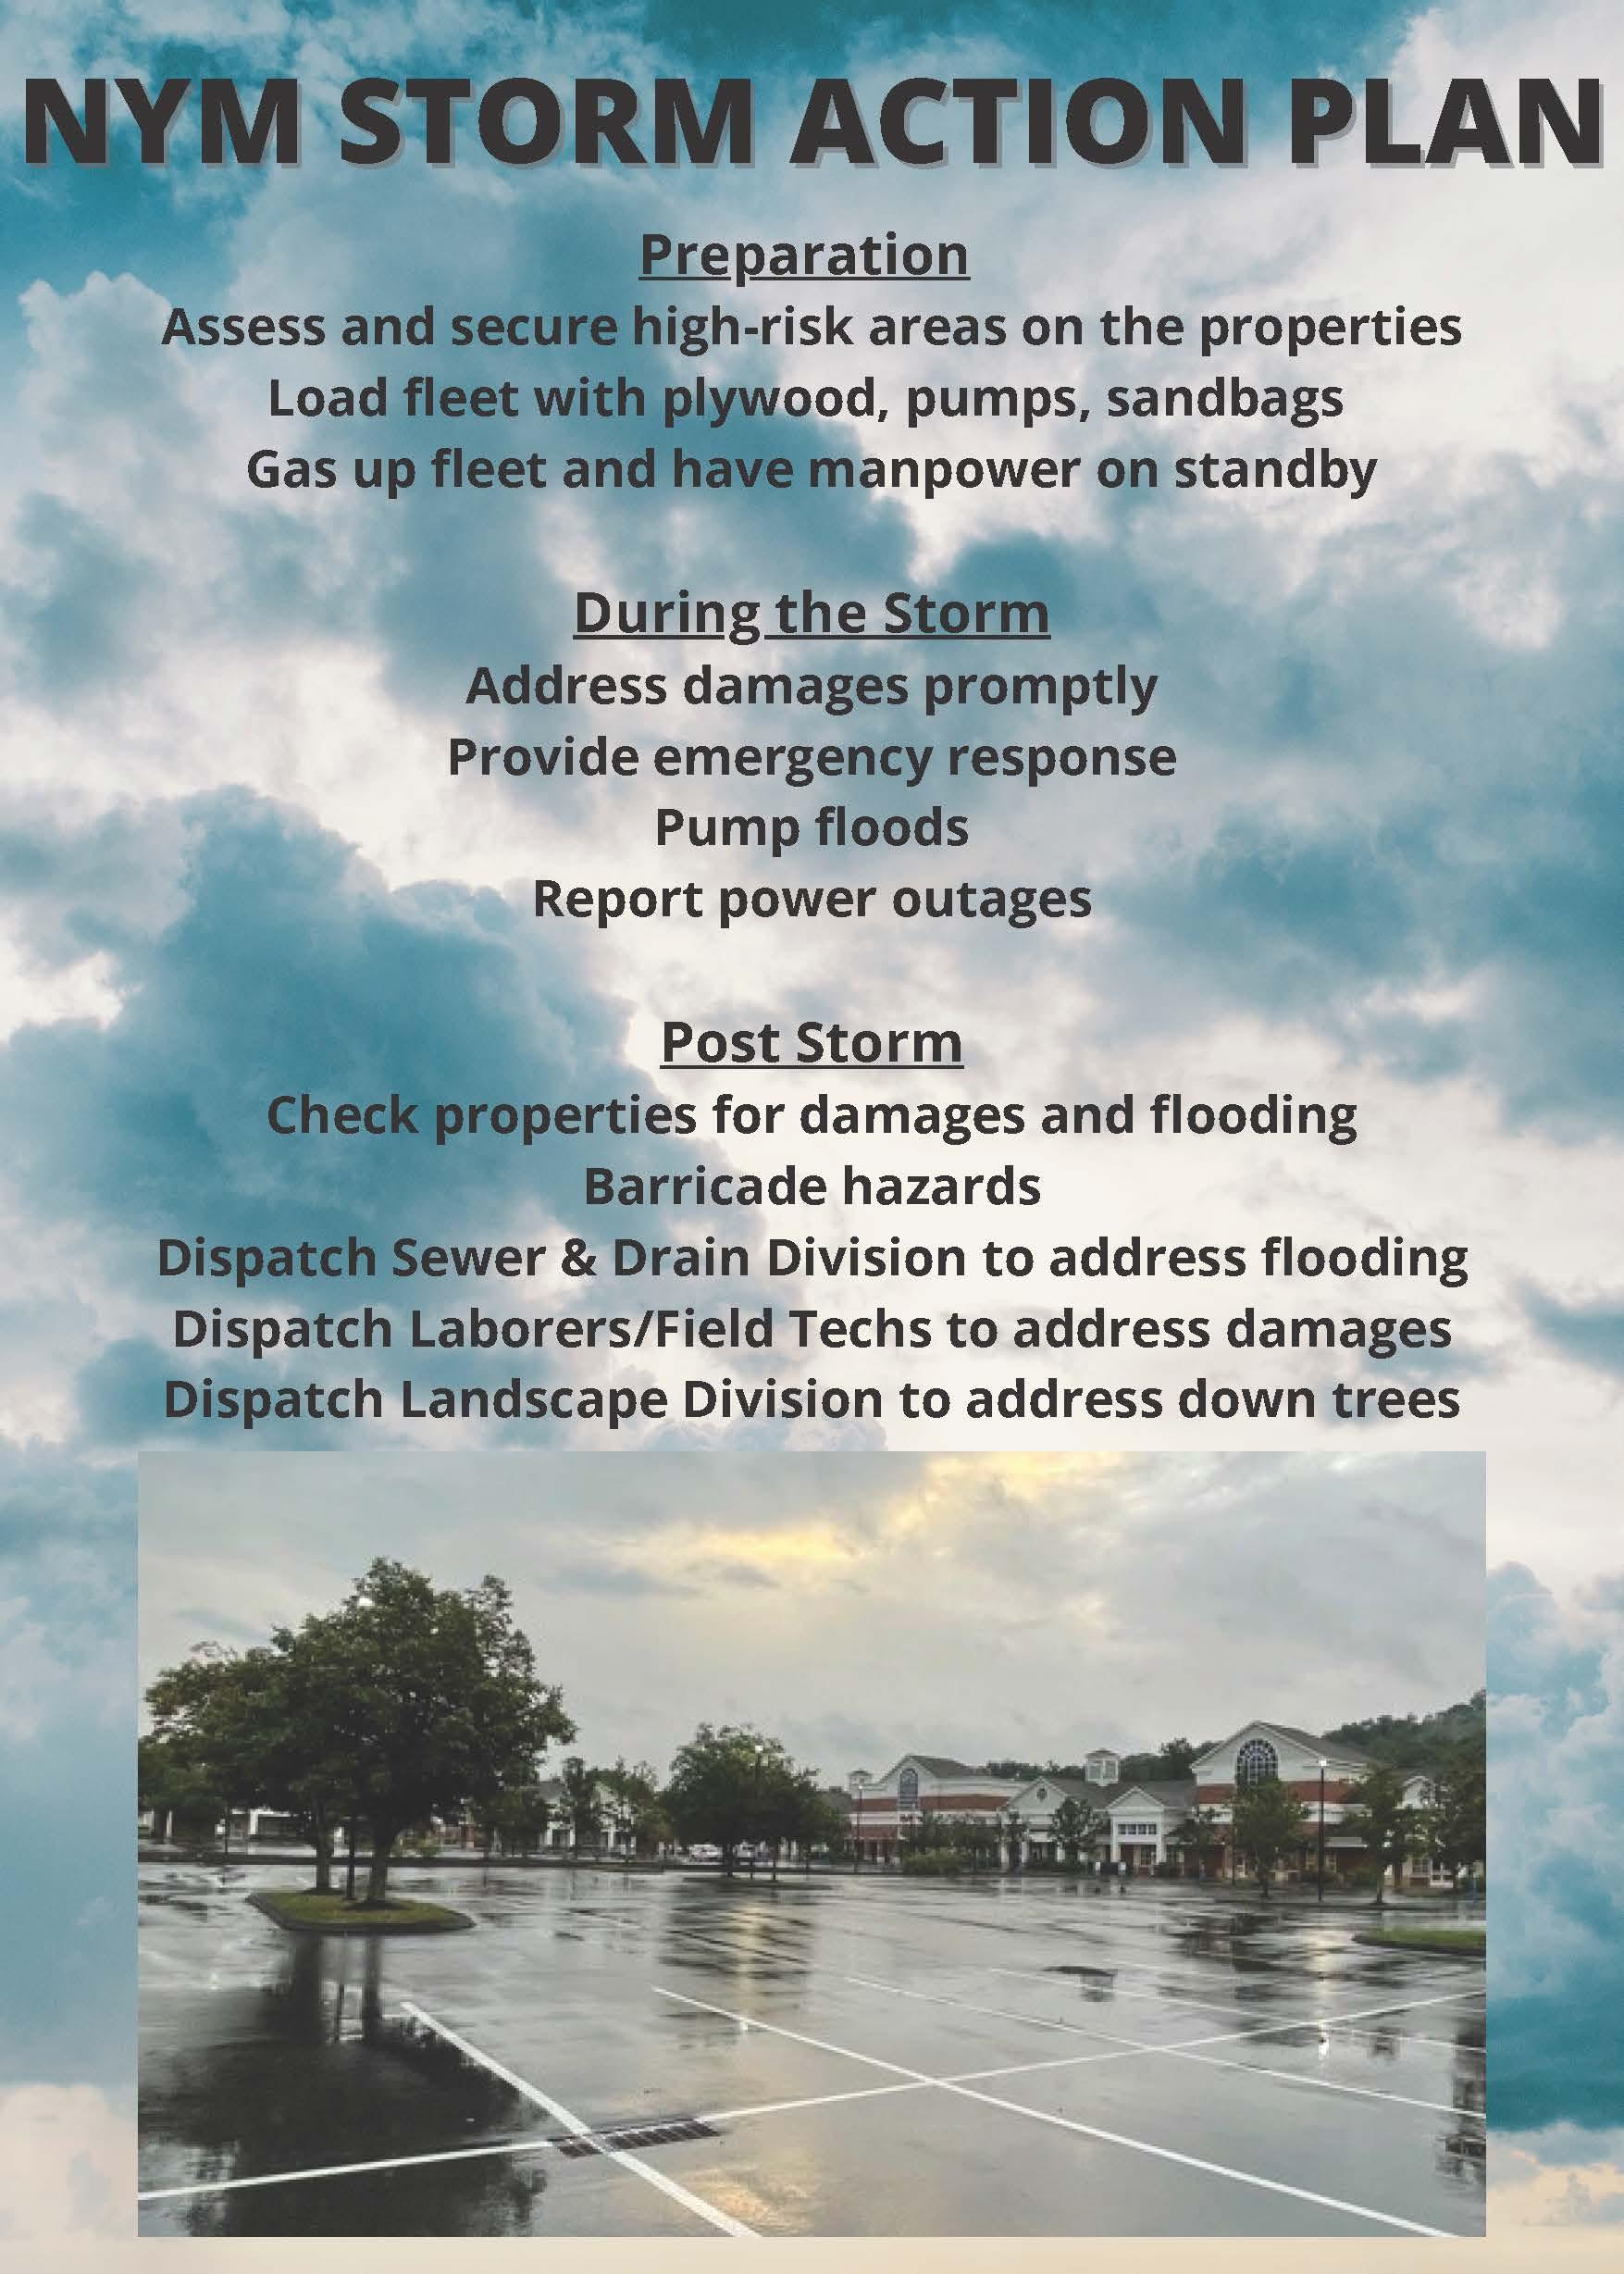 NYM Storm Action Plan